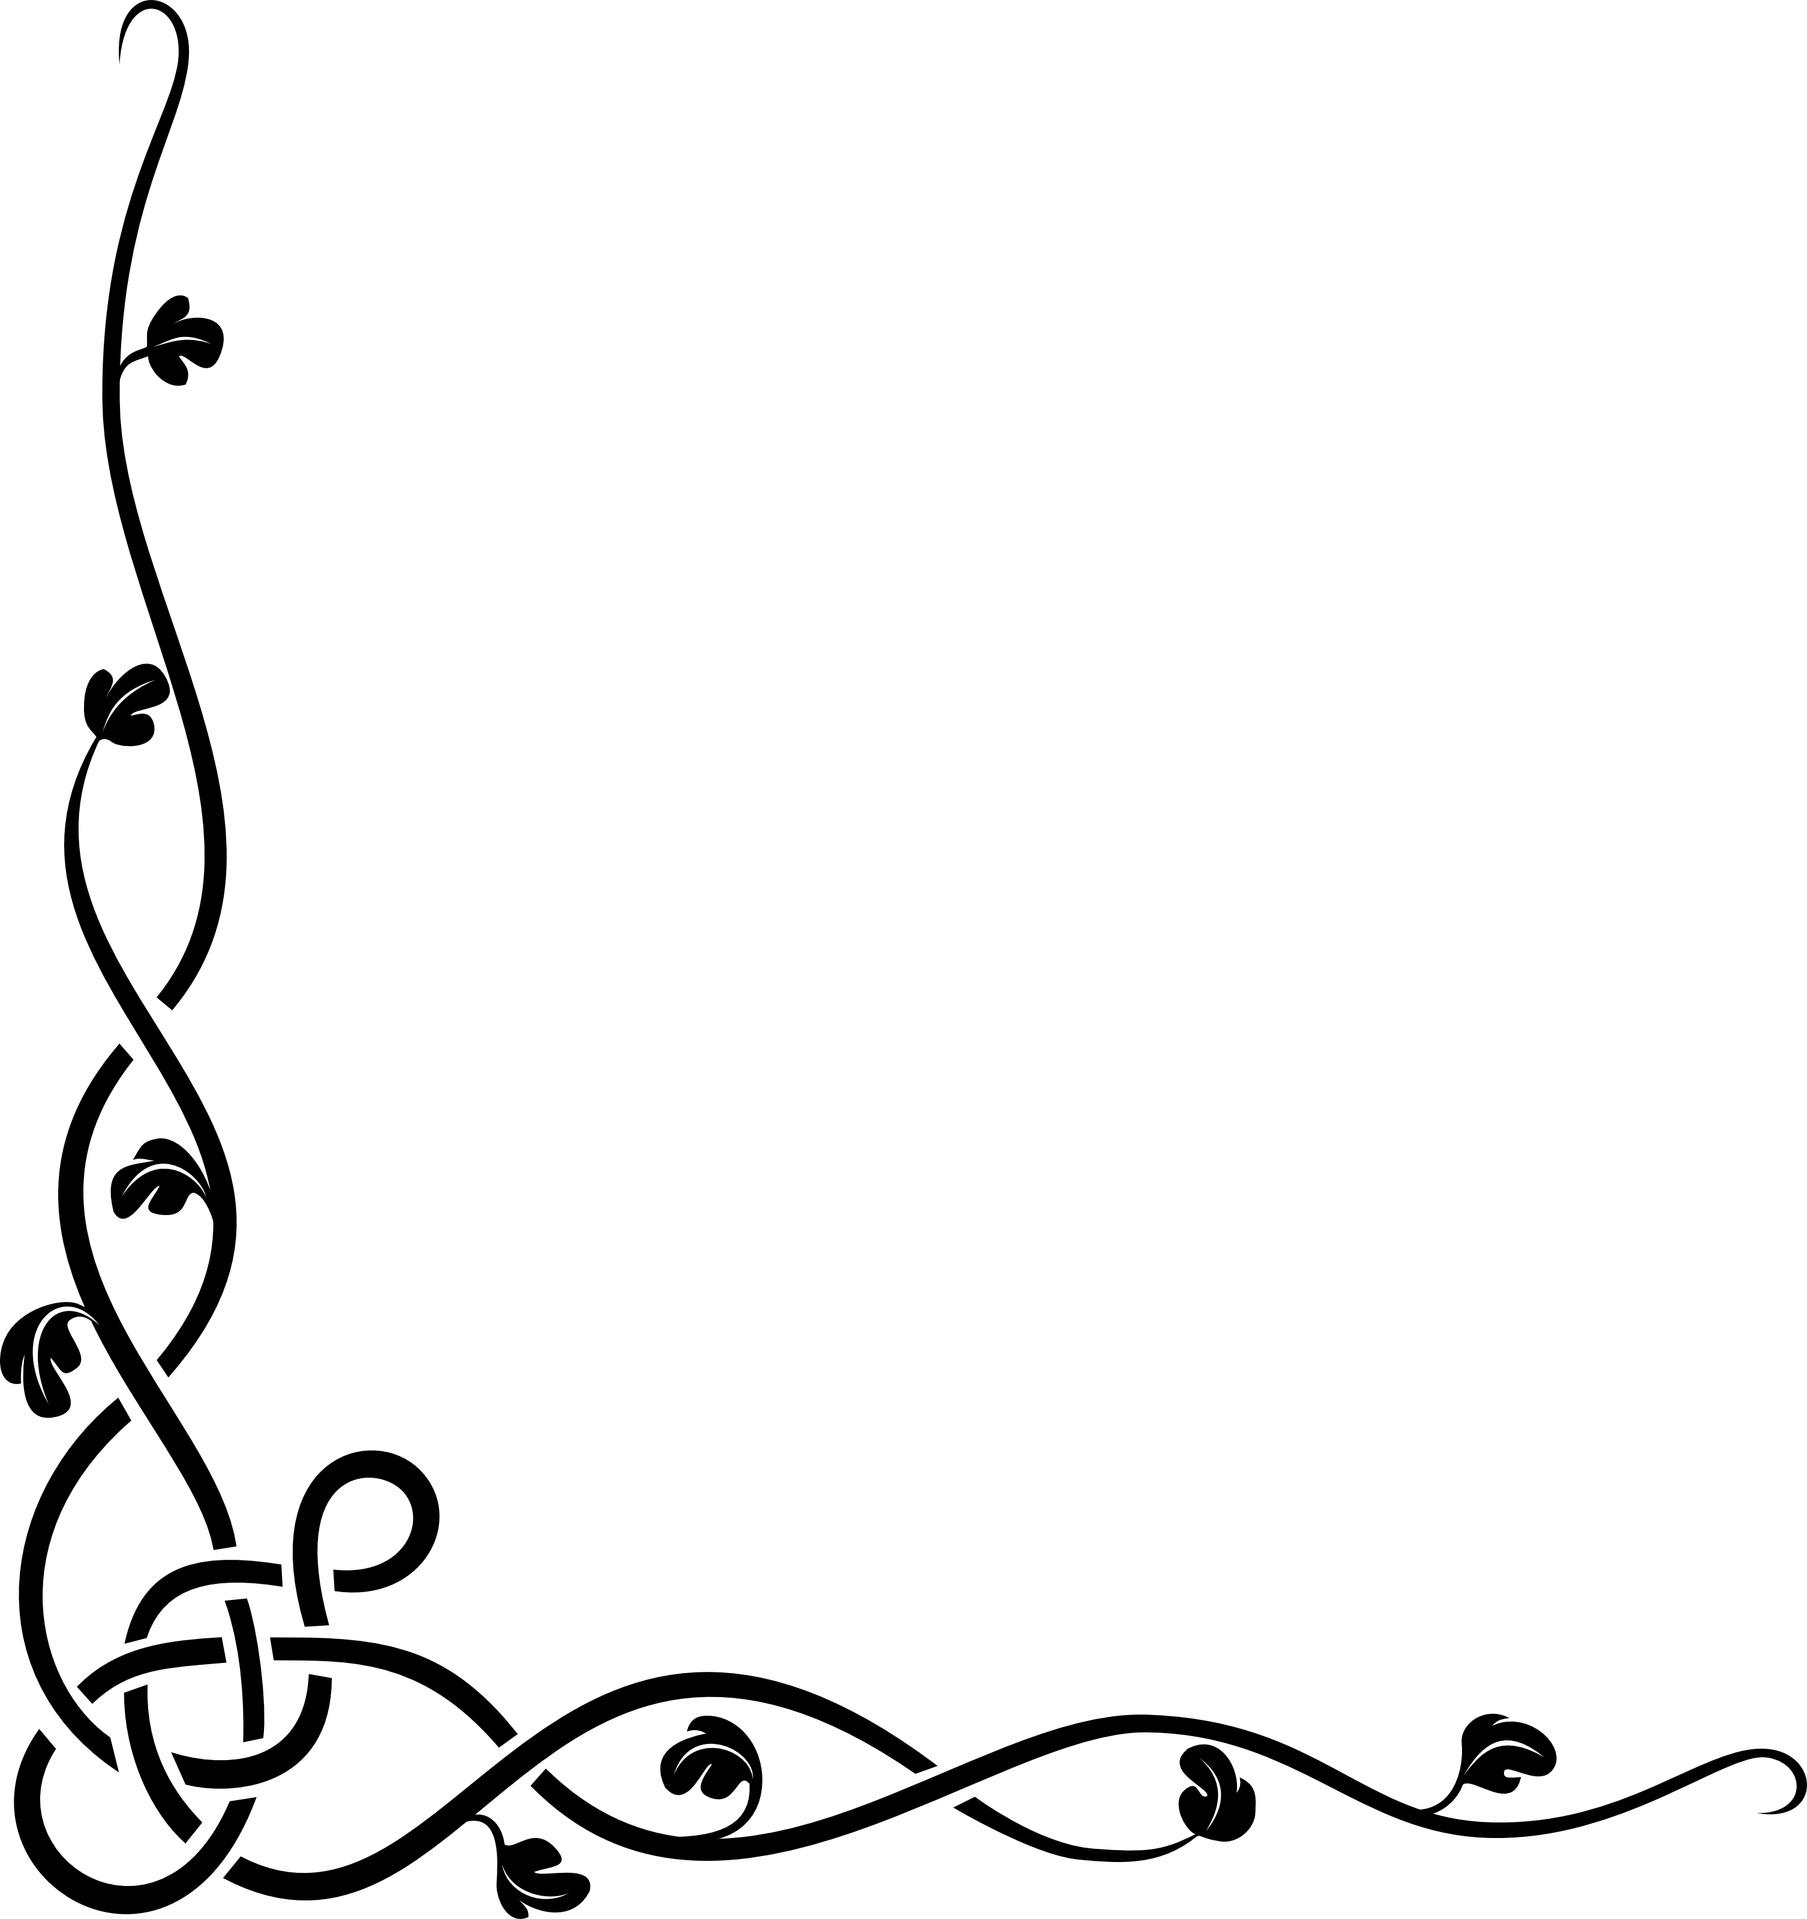 Celtic Knot Page Border